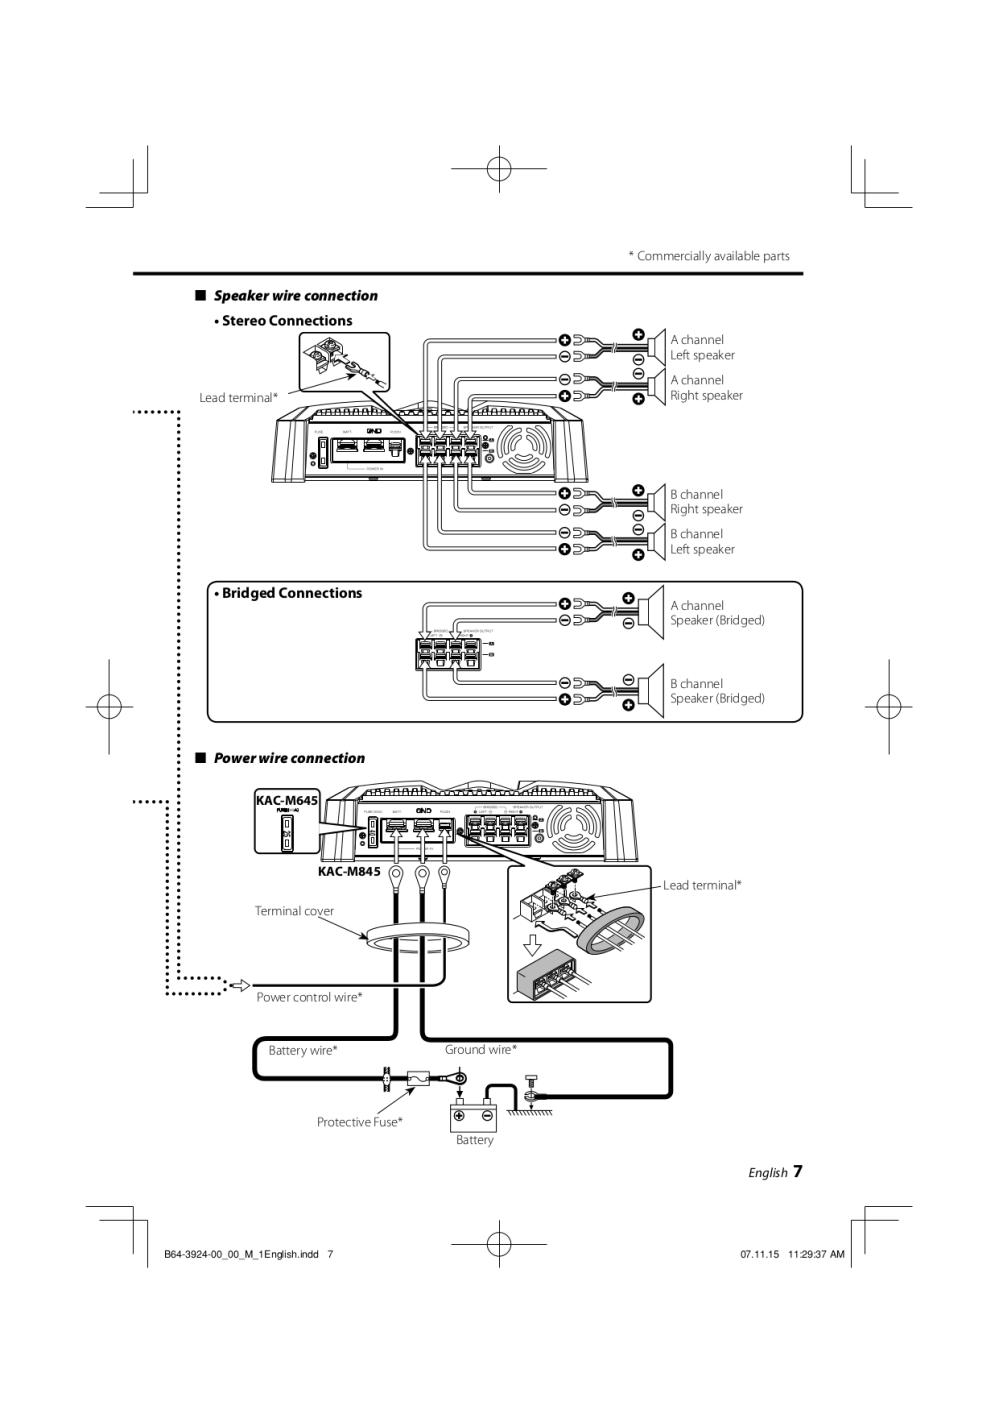 medium resolution of kenwood amp kac 720 diagram wiring diagrams kenwood kac 720 wiring harness diagram stereo power amp